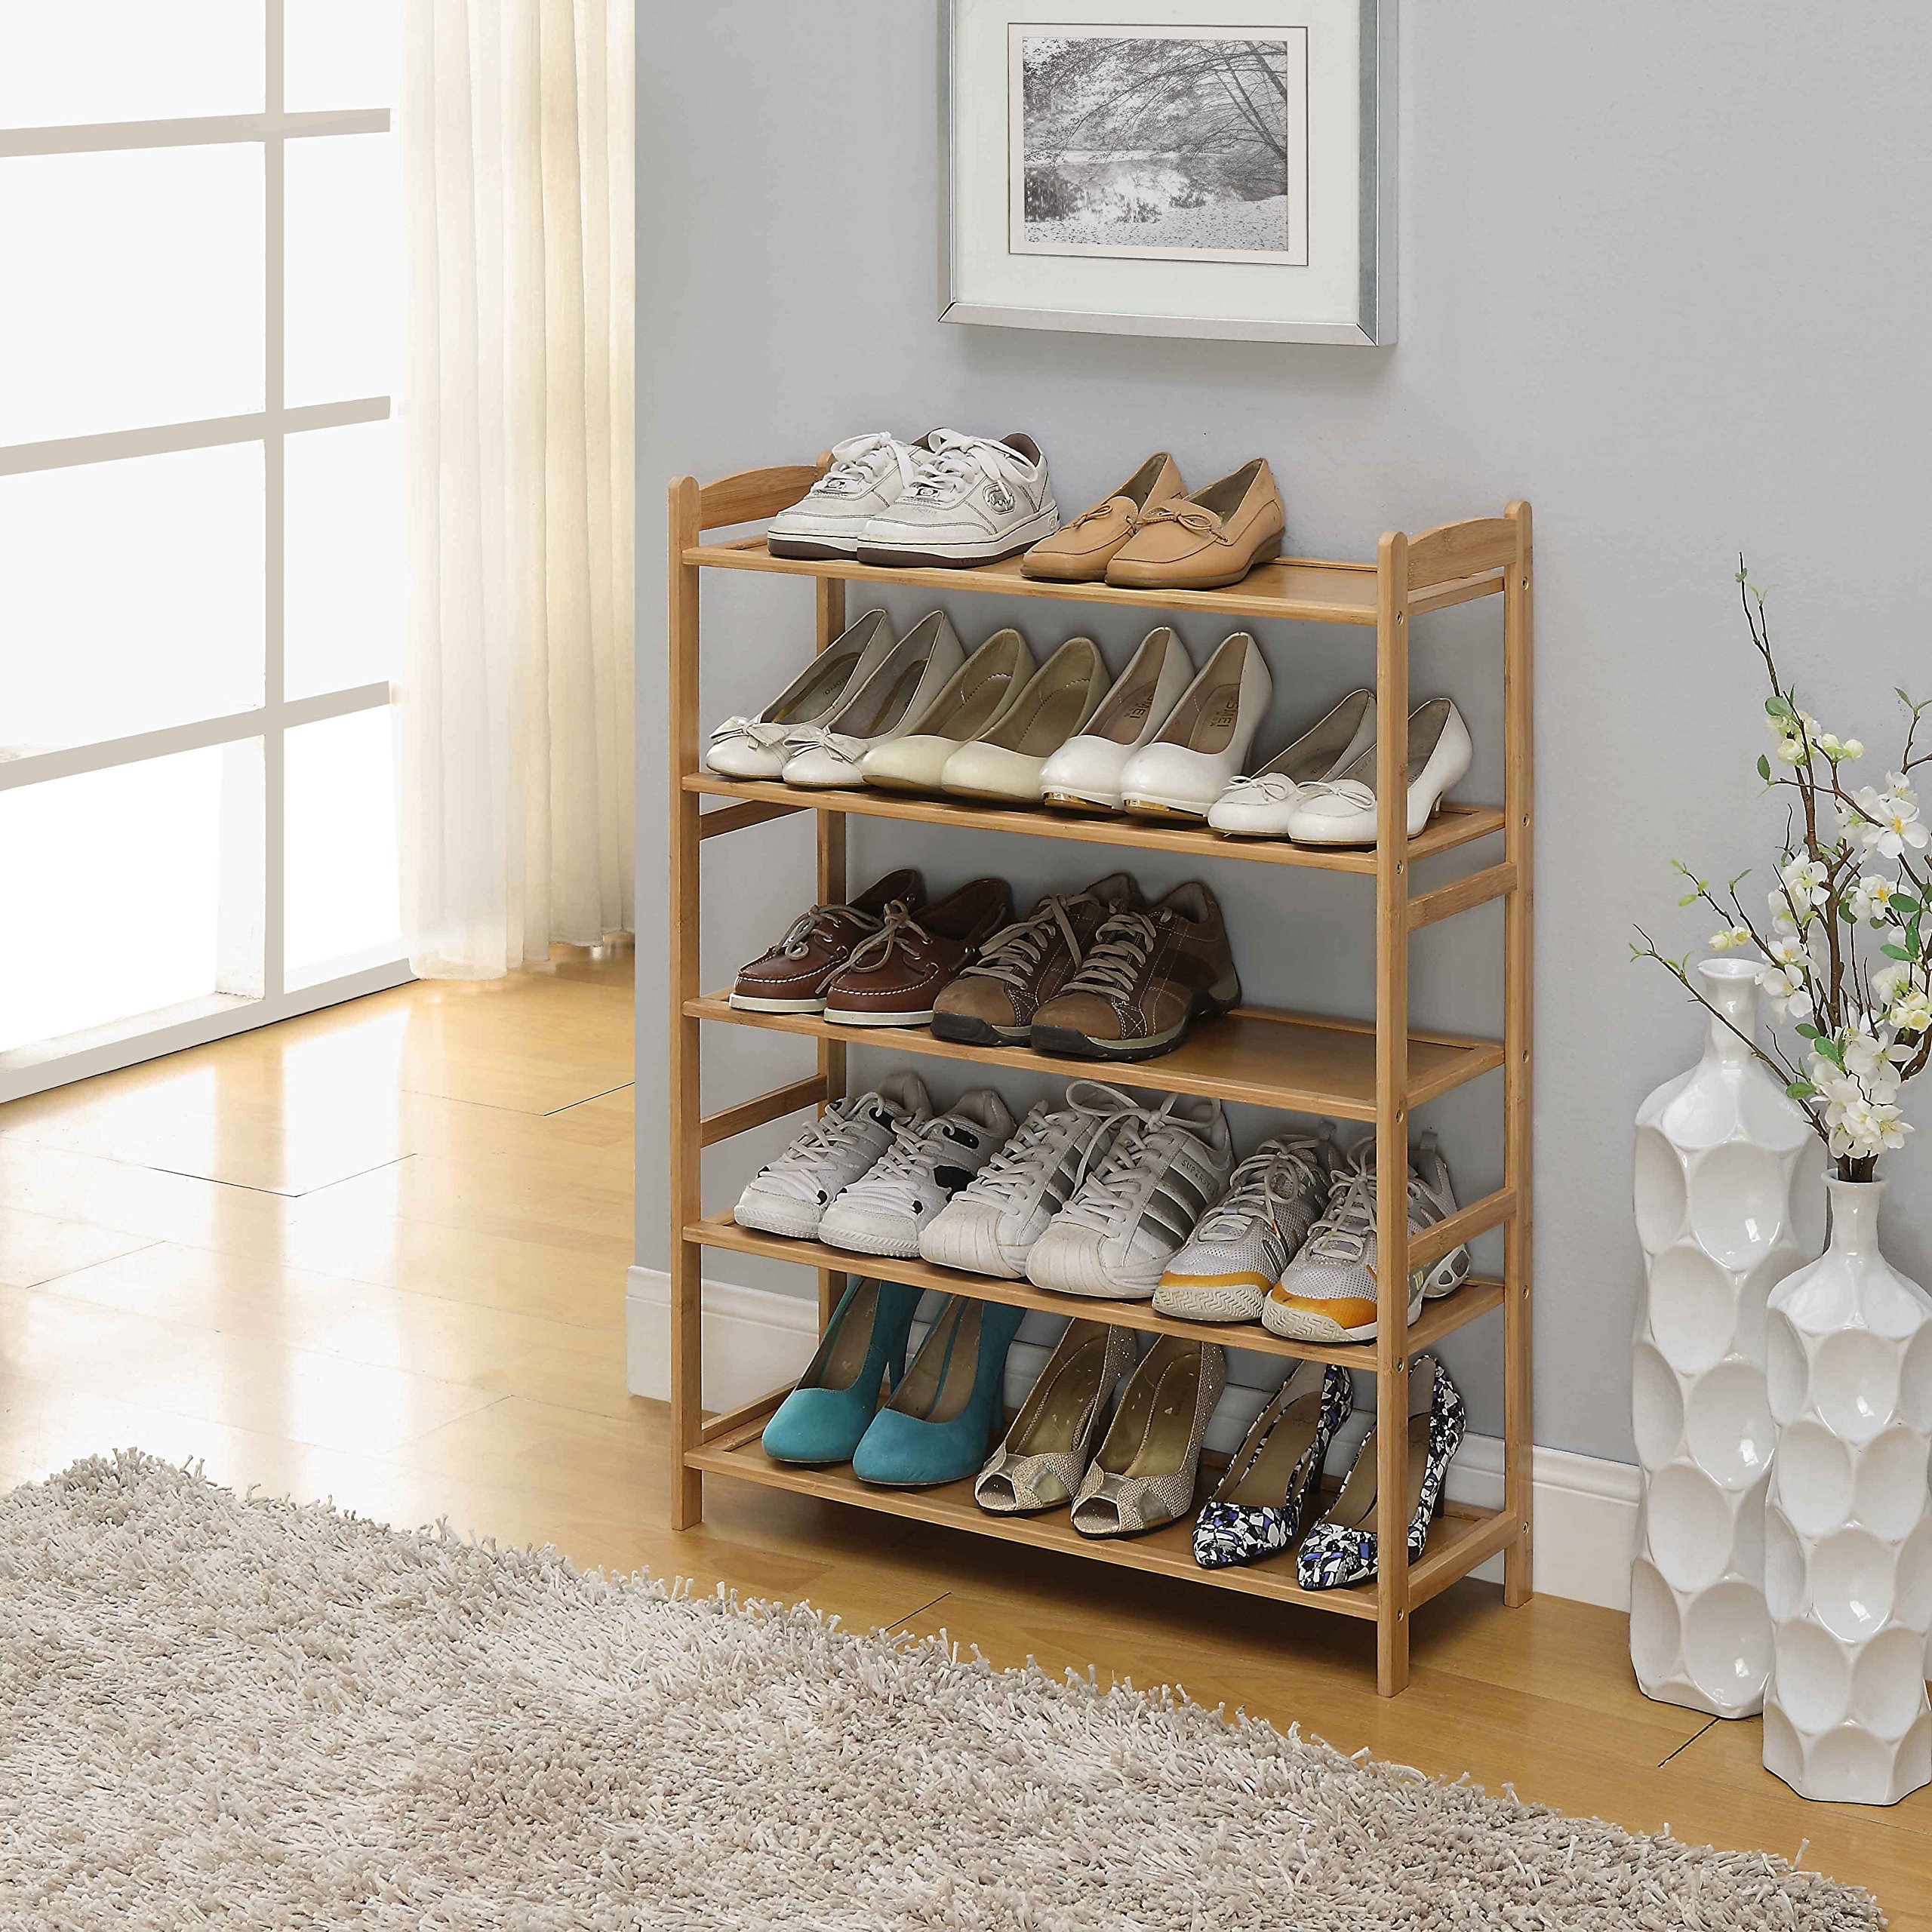 100% Natural Bamboo Wood 5-Tier Shoe Storage Racks Shelf Organizer